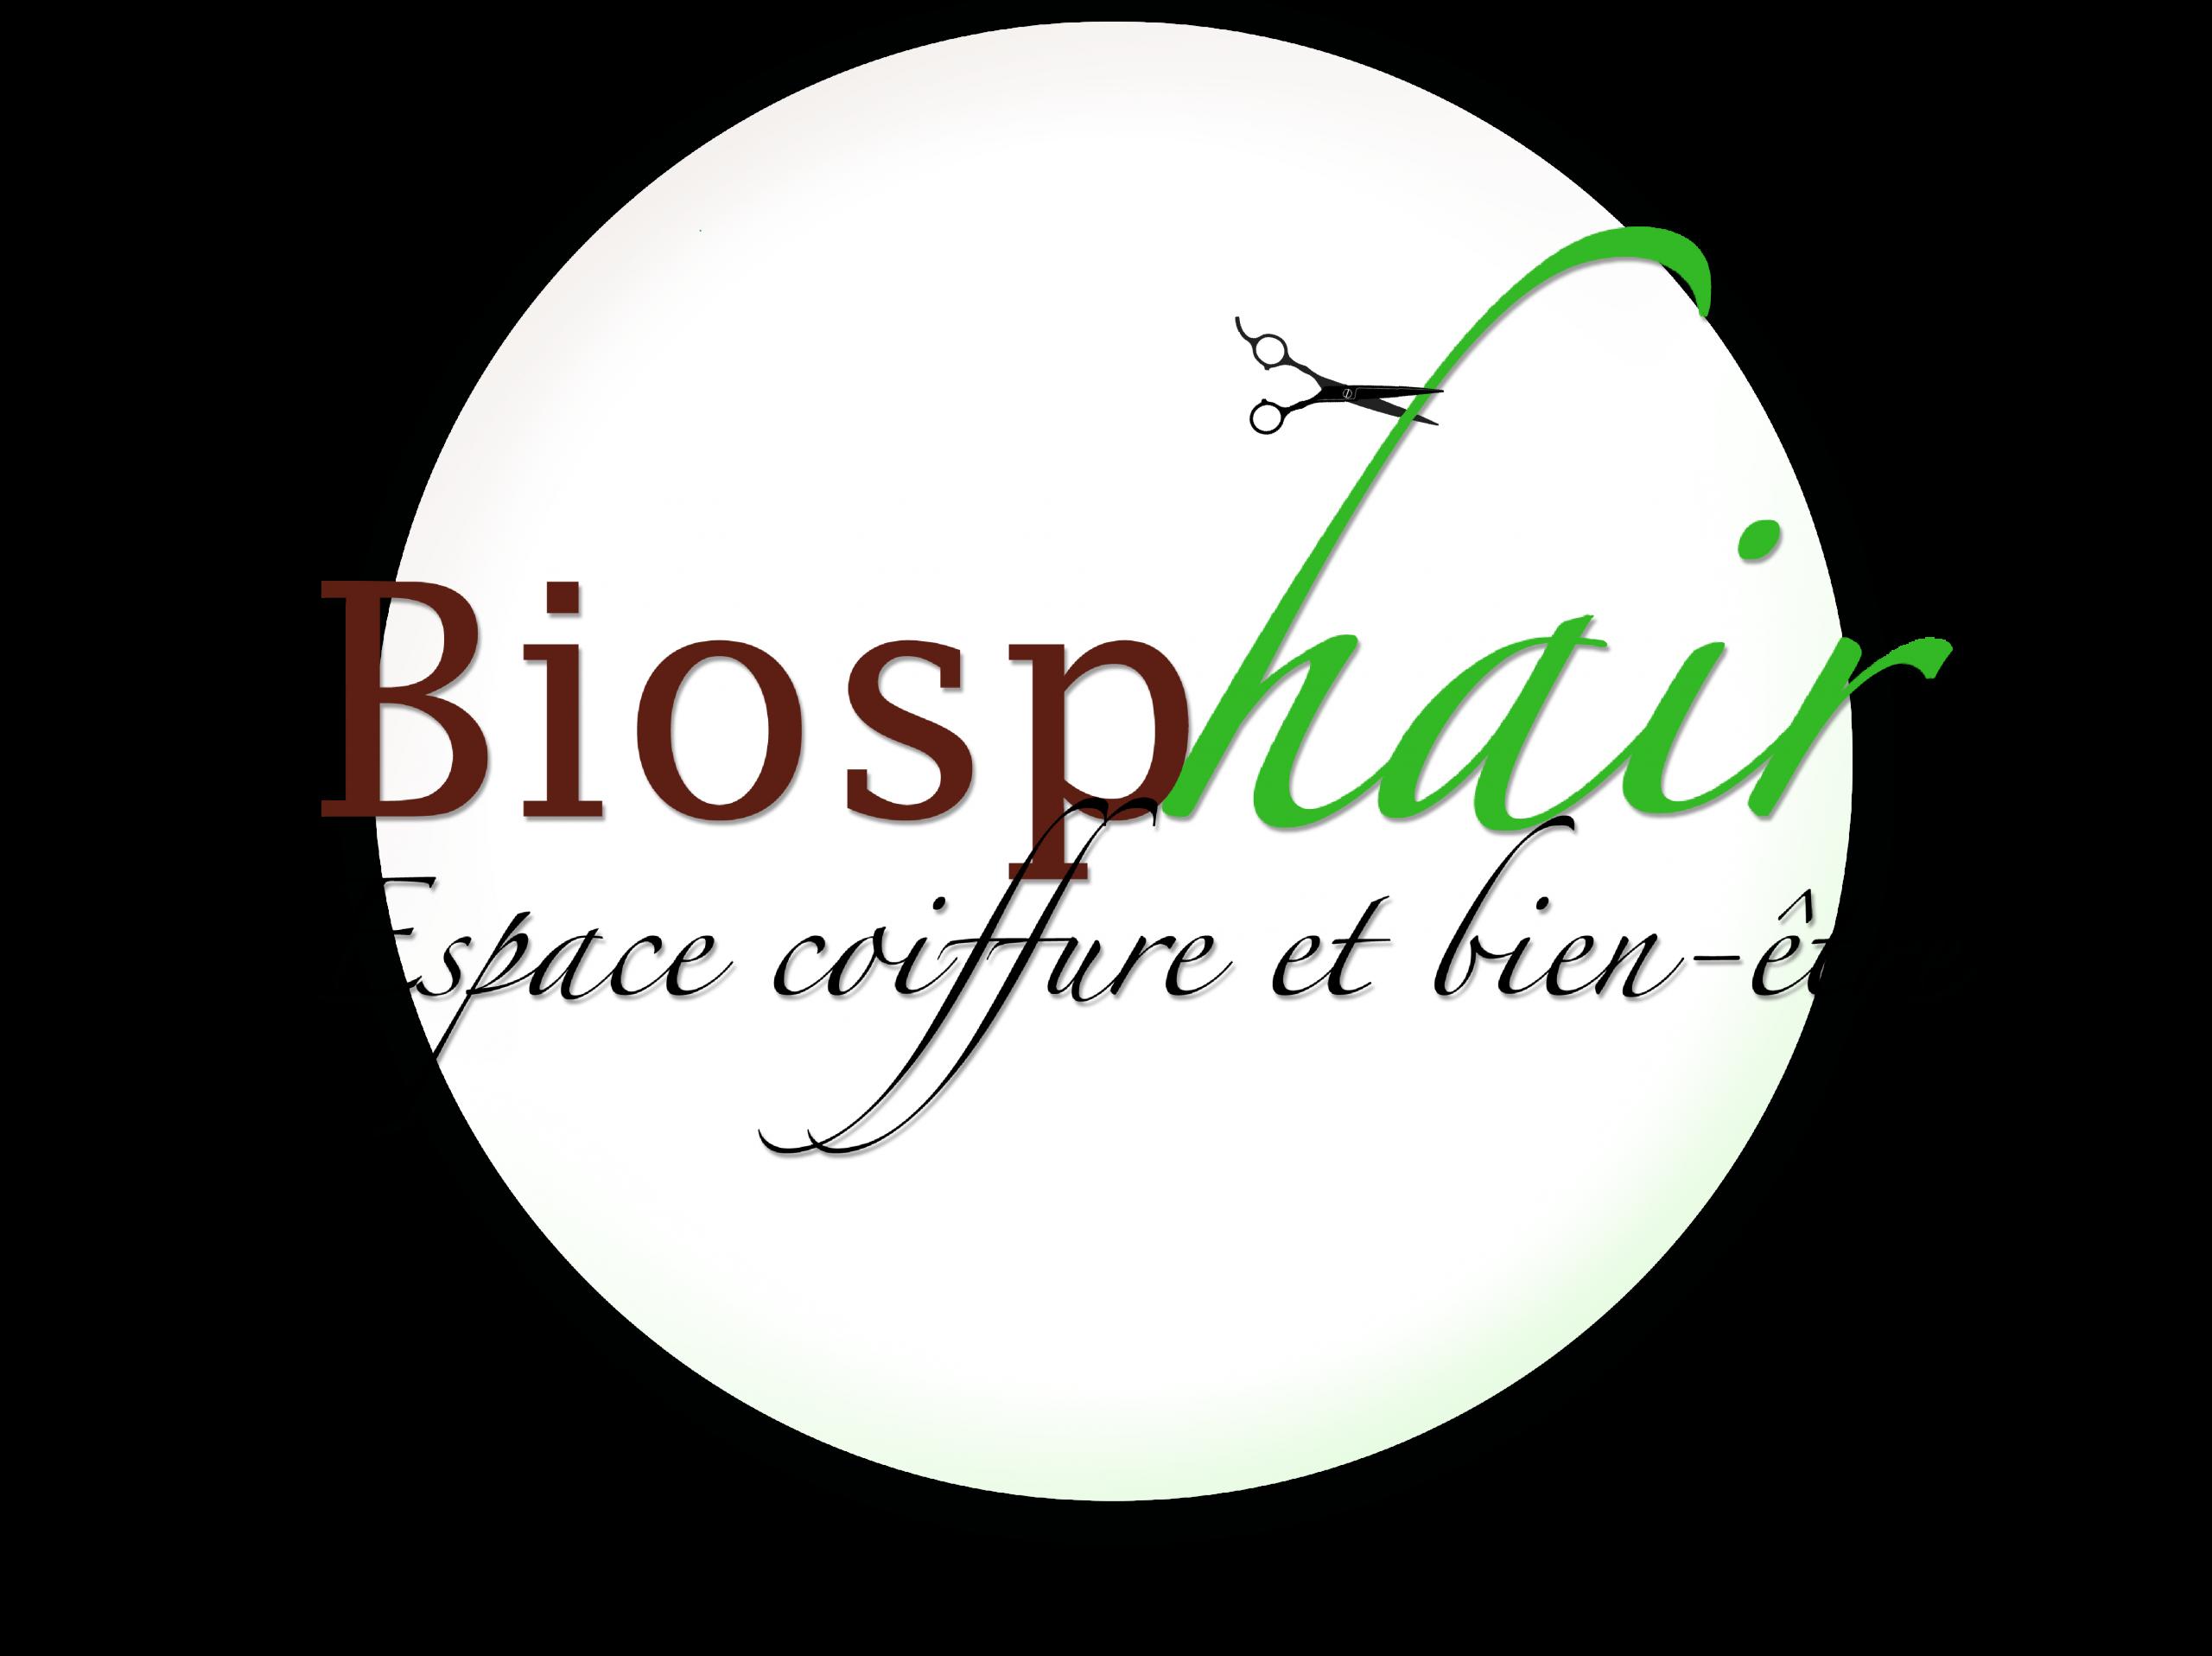 Biosphair Coiffure